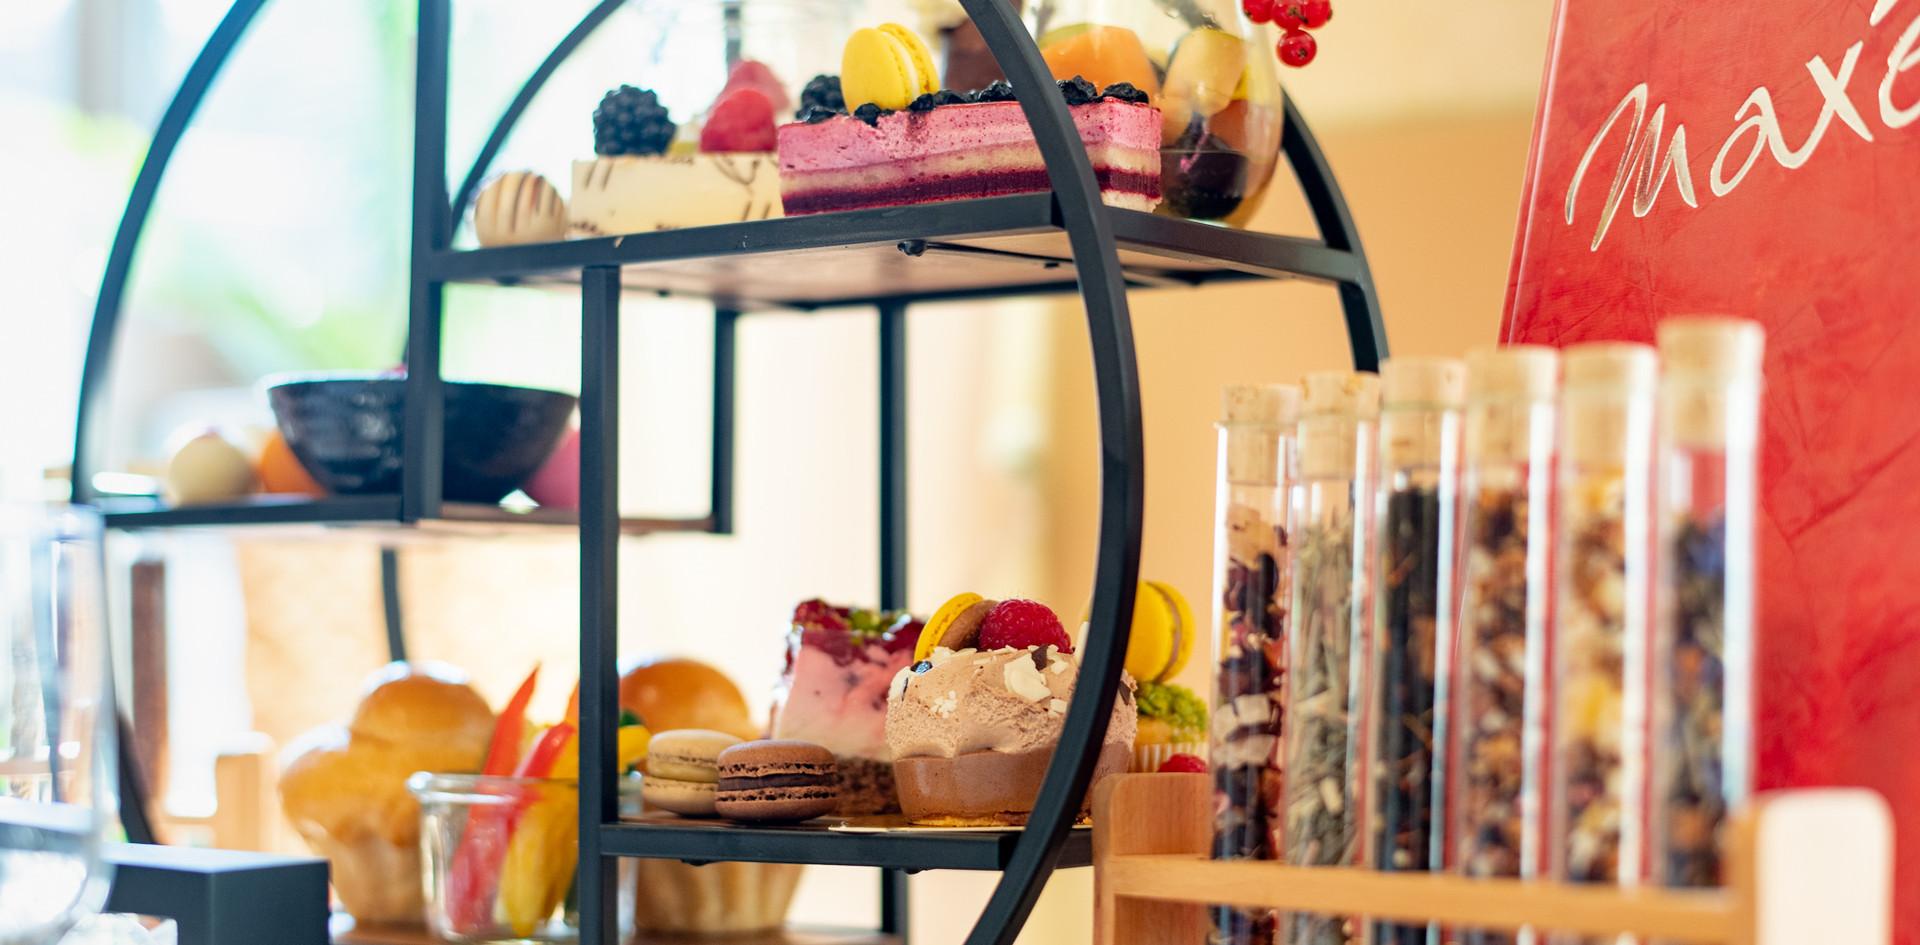 loser Tee in Reagenzglas Afternoon Tea - Hotel Wegner - The culinary Art Hotel